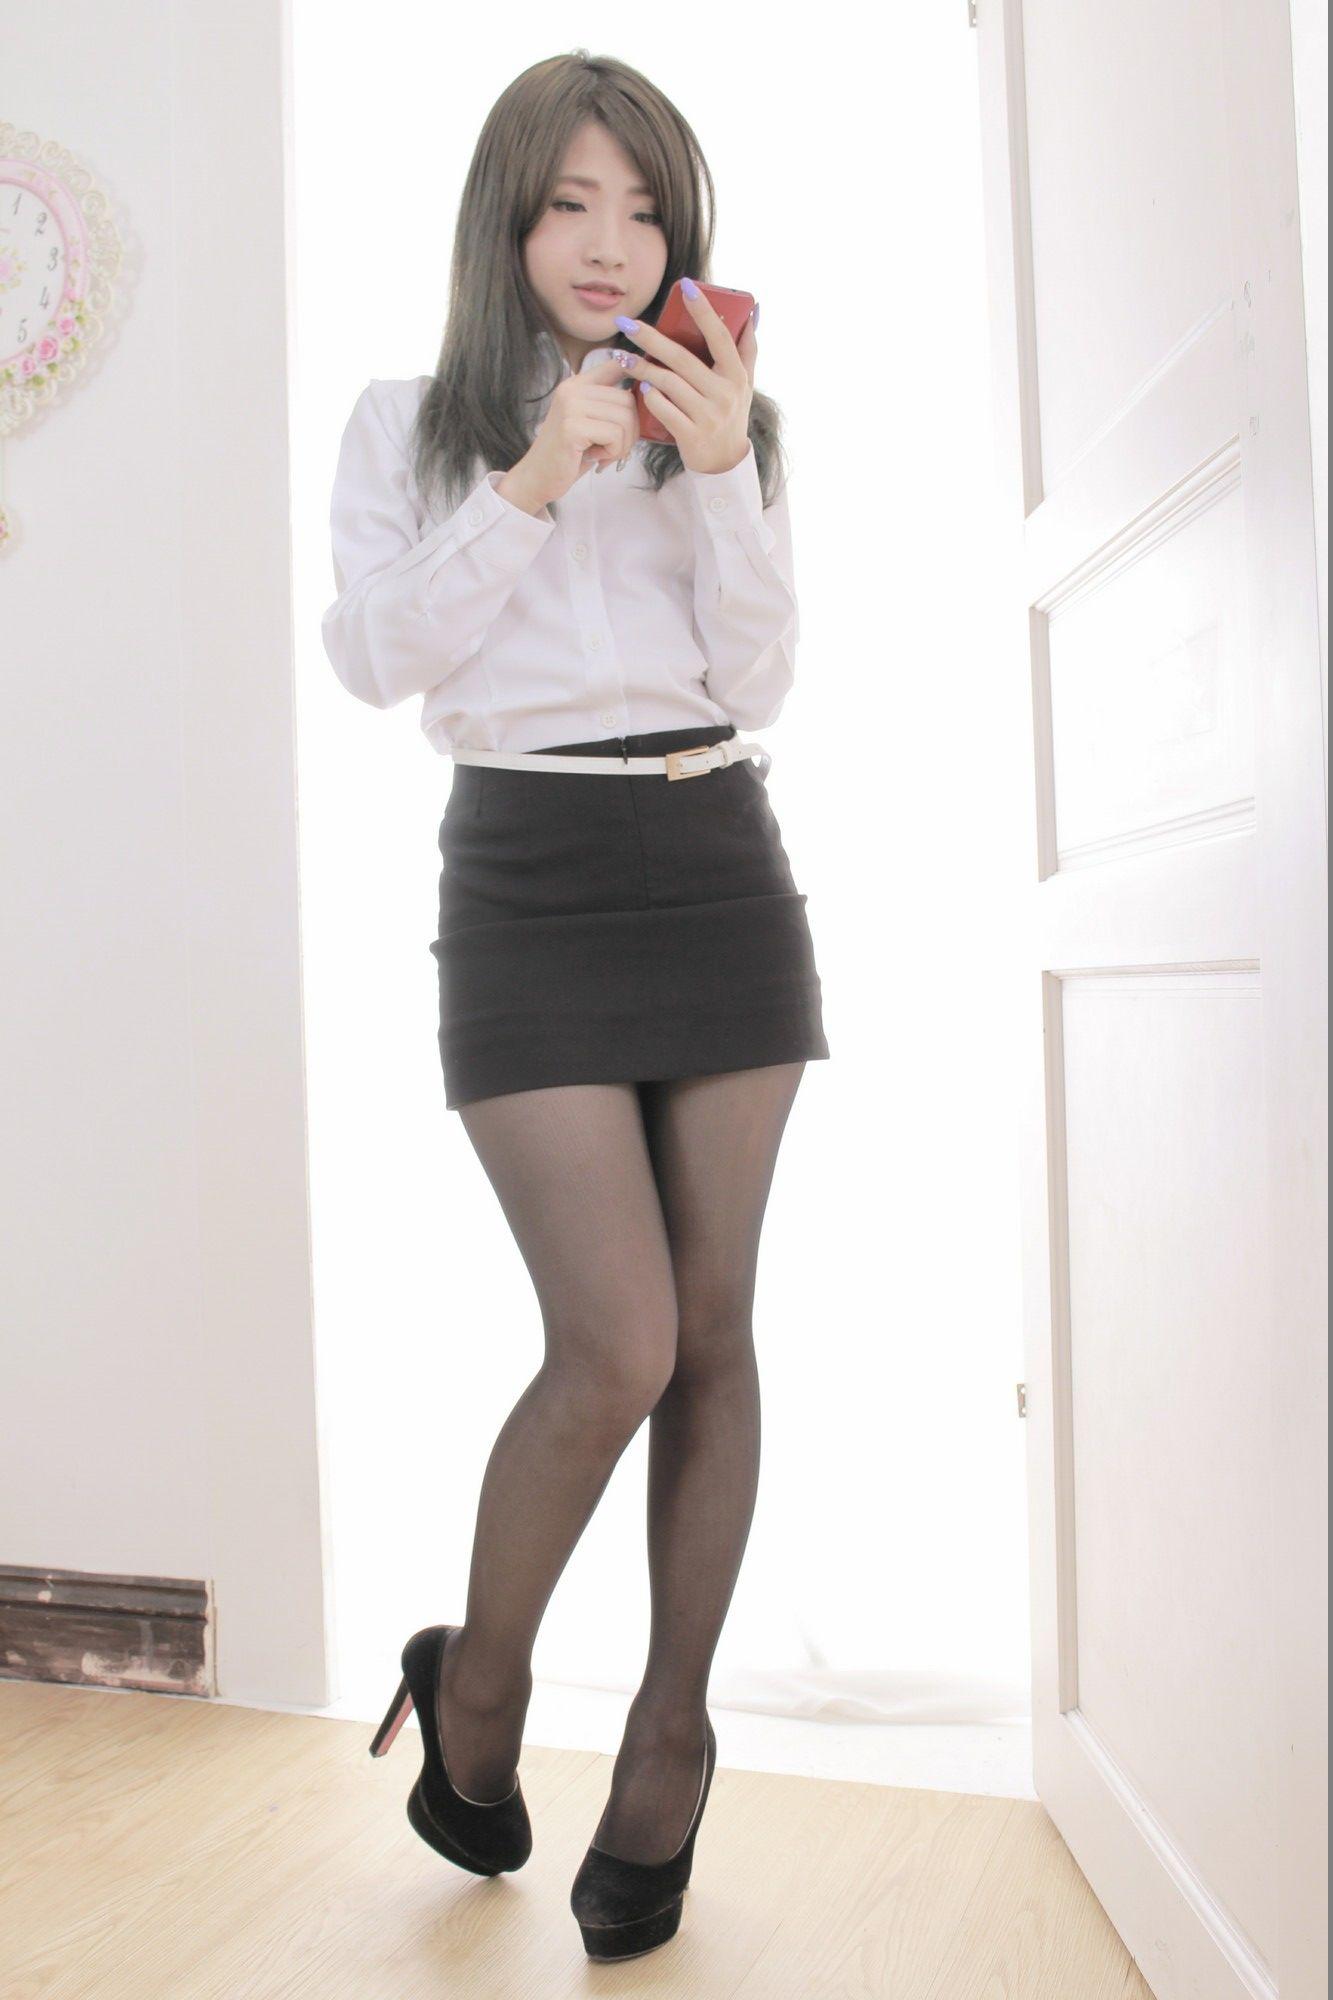 VOL.438 [台湾正妹]黑丝OL美女包臀裙美女:胡安绮(Chichy胡绮)超高清个人性感漂亮大图(64P)